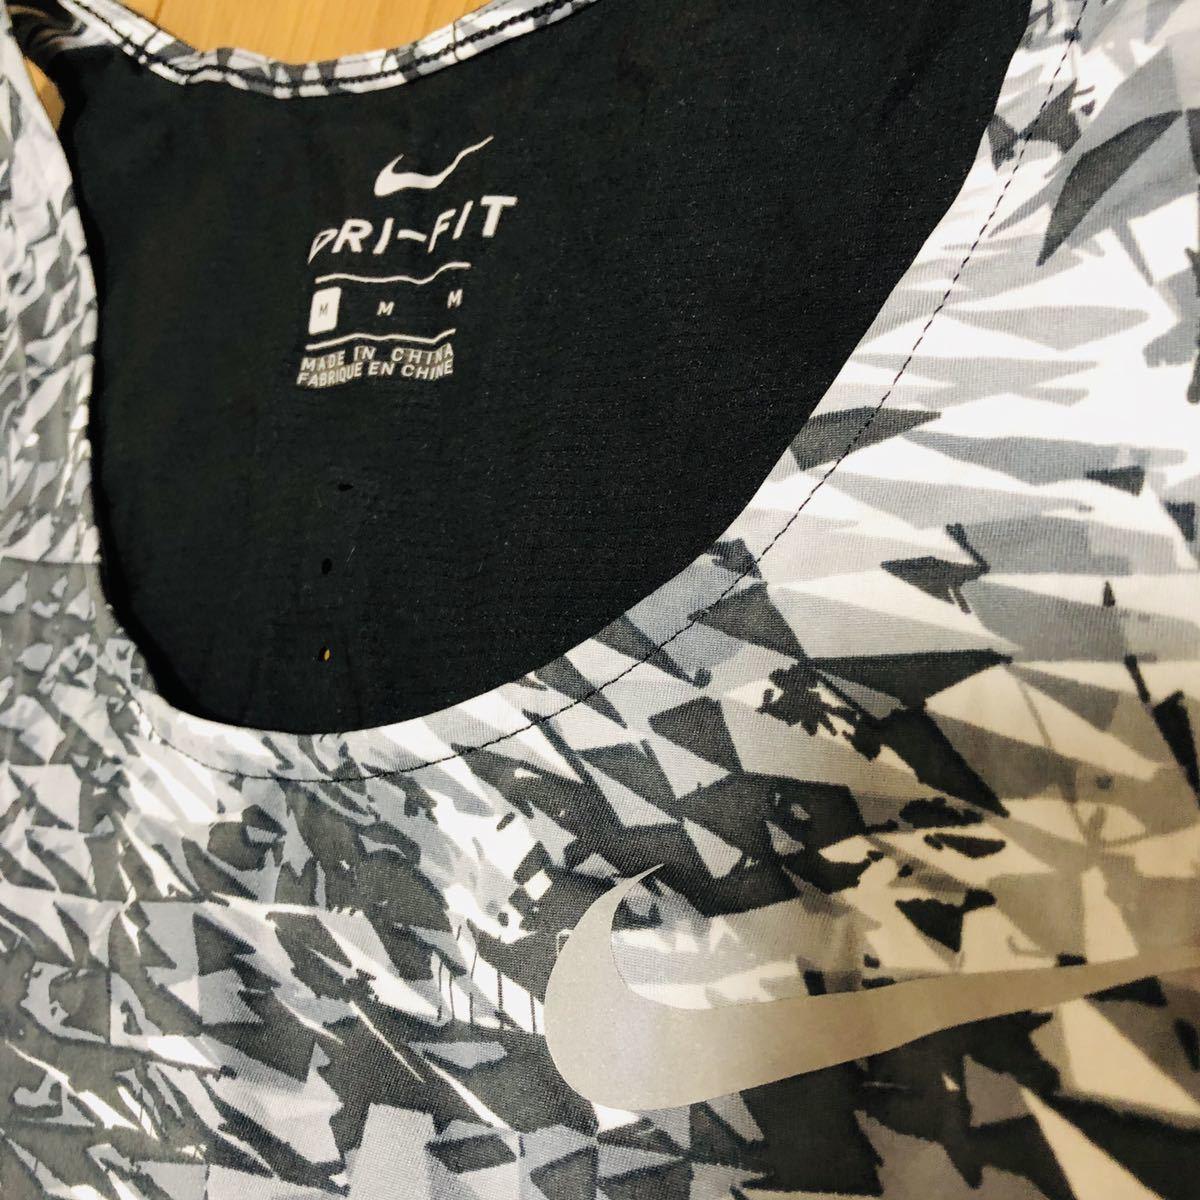 NIKE ナイキ シングレット タンクトップ ランニング マラソン 陸上ランニングシャツ ブリーズ ラン 黒 ダイヤ柄 古着